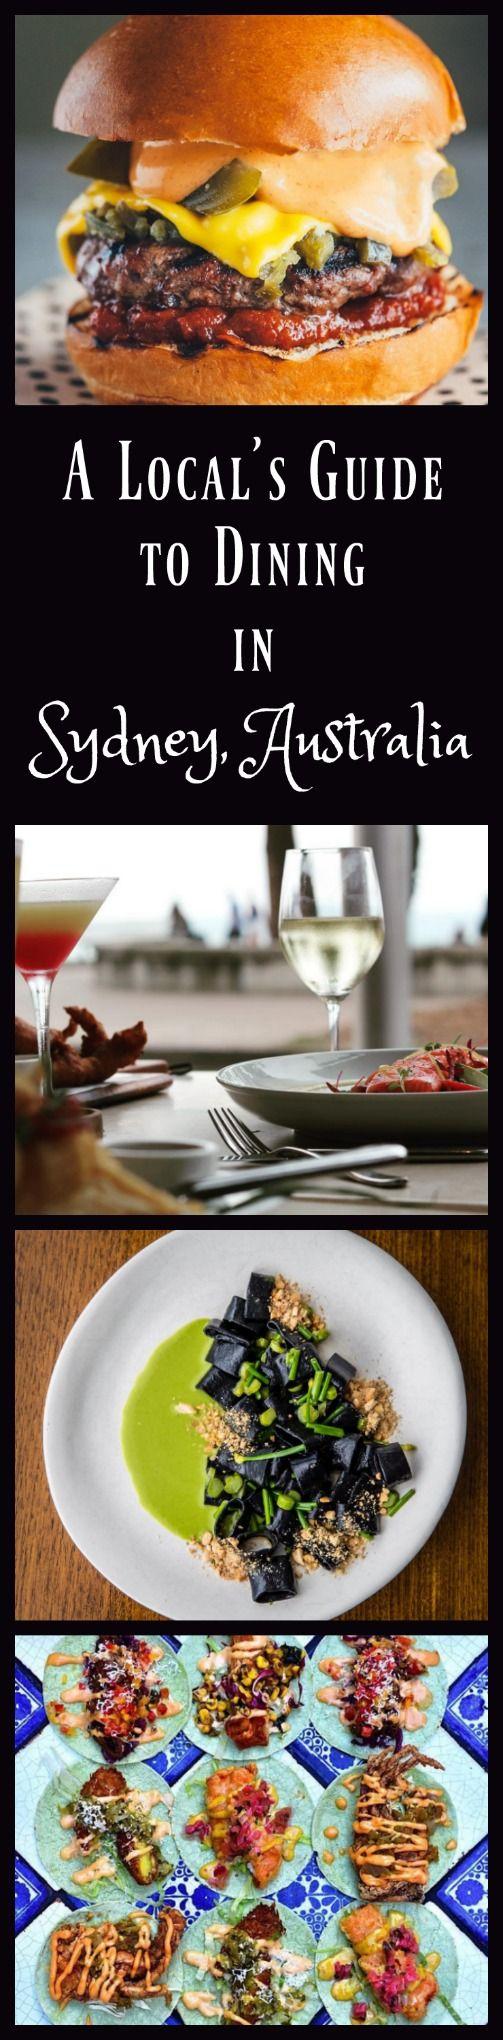 Exquisite Restaurants in Sydney - The Daily Adventures of Me